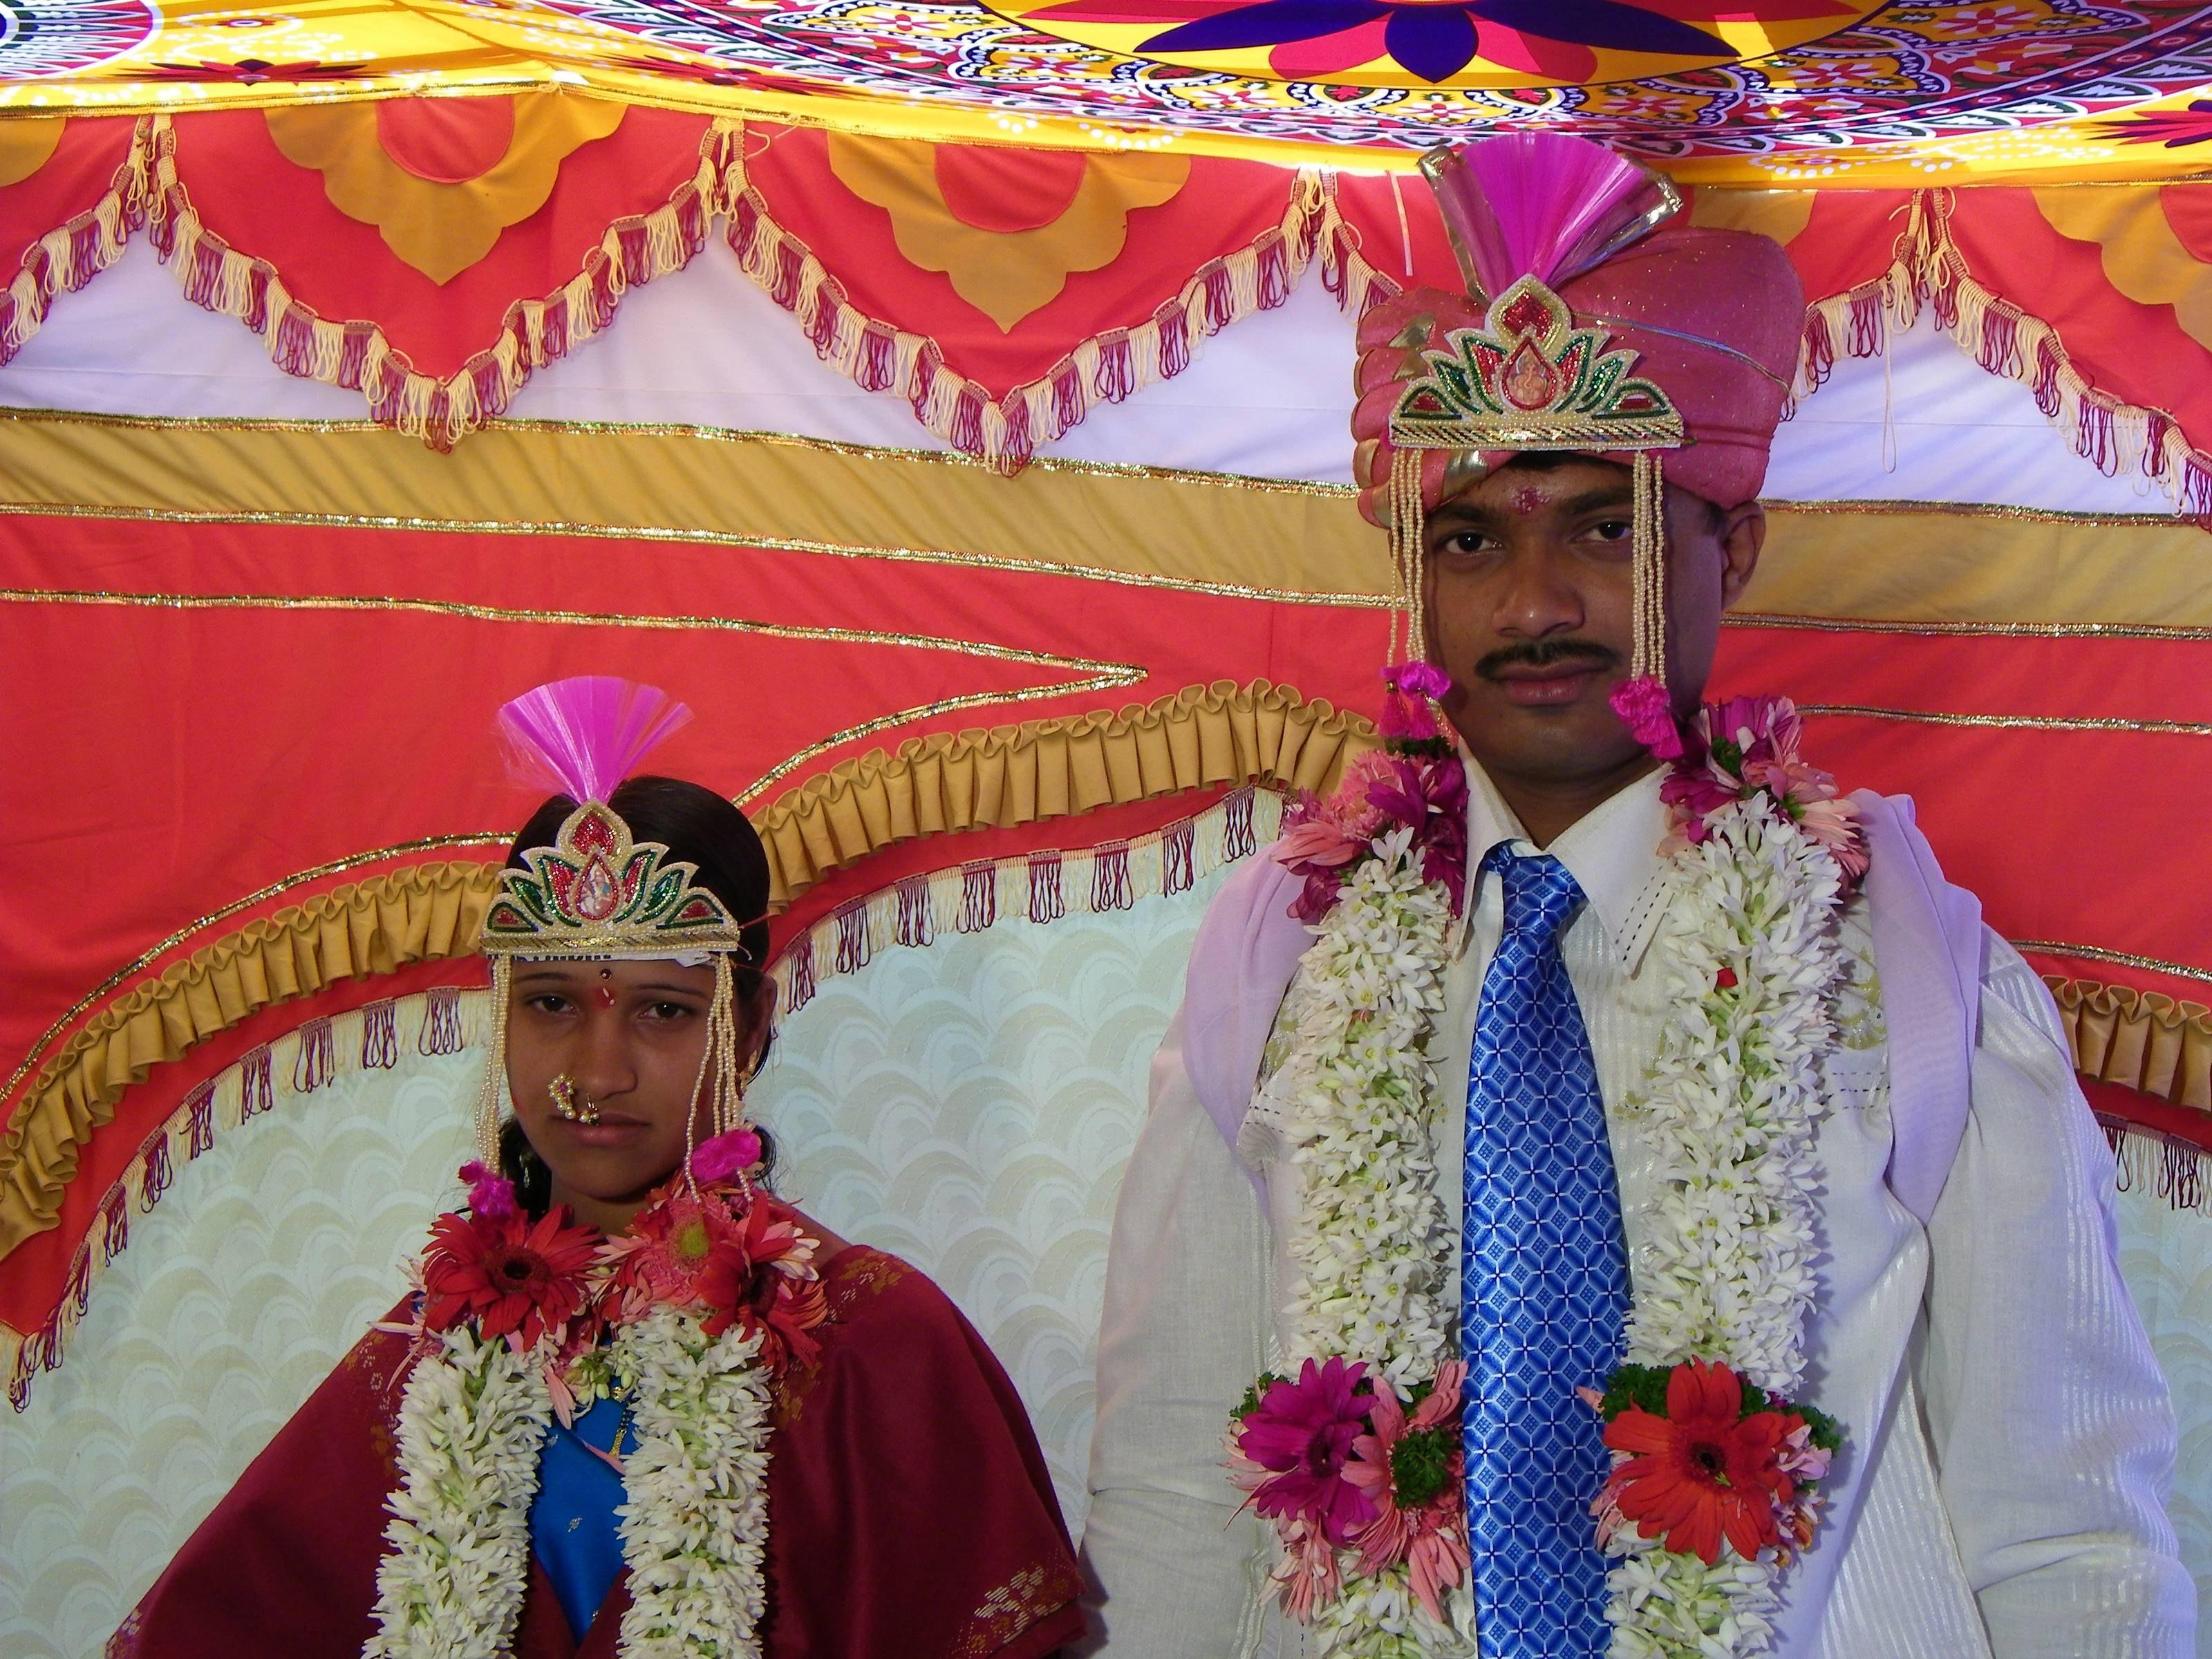 Bentuk Kebaya Bridesmaid Hijab Modern 4pde Deepu Rajalakshmi Hindu Wedding